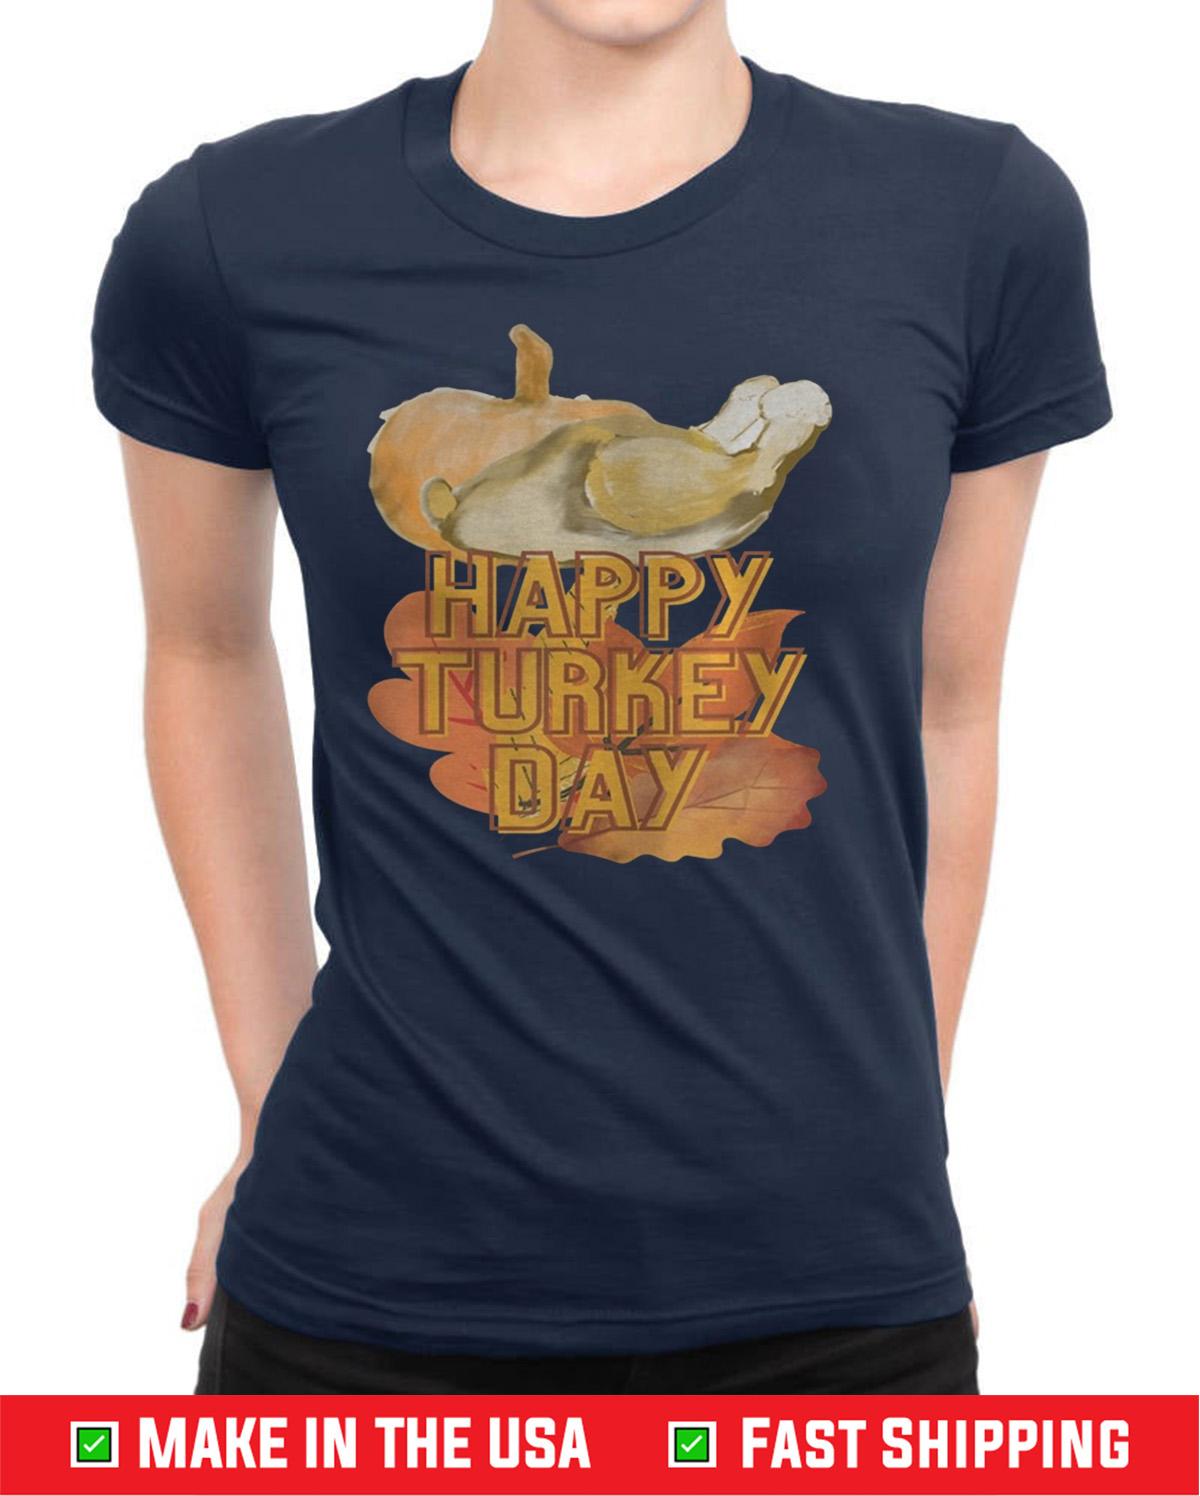 Happy Turkey Day Pumpkin Holiday Gift T-Shirts